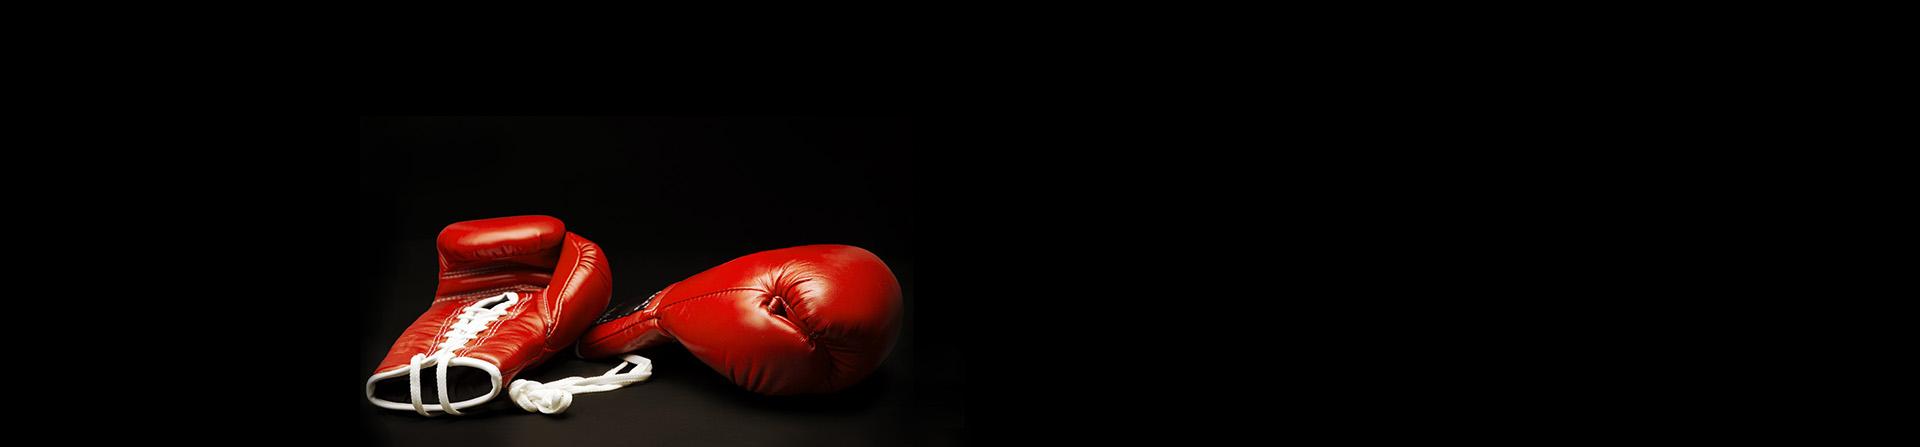 BA_DAPS_Kick boxing_M Benmadil_2018.jpg